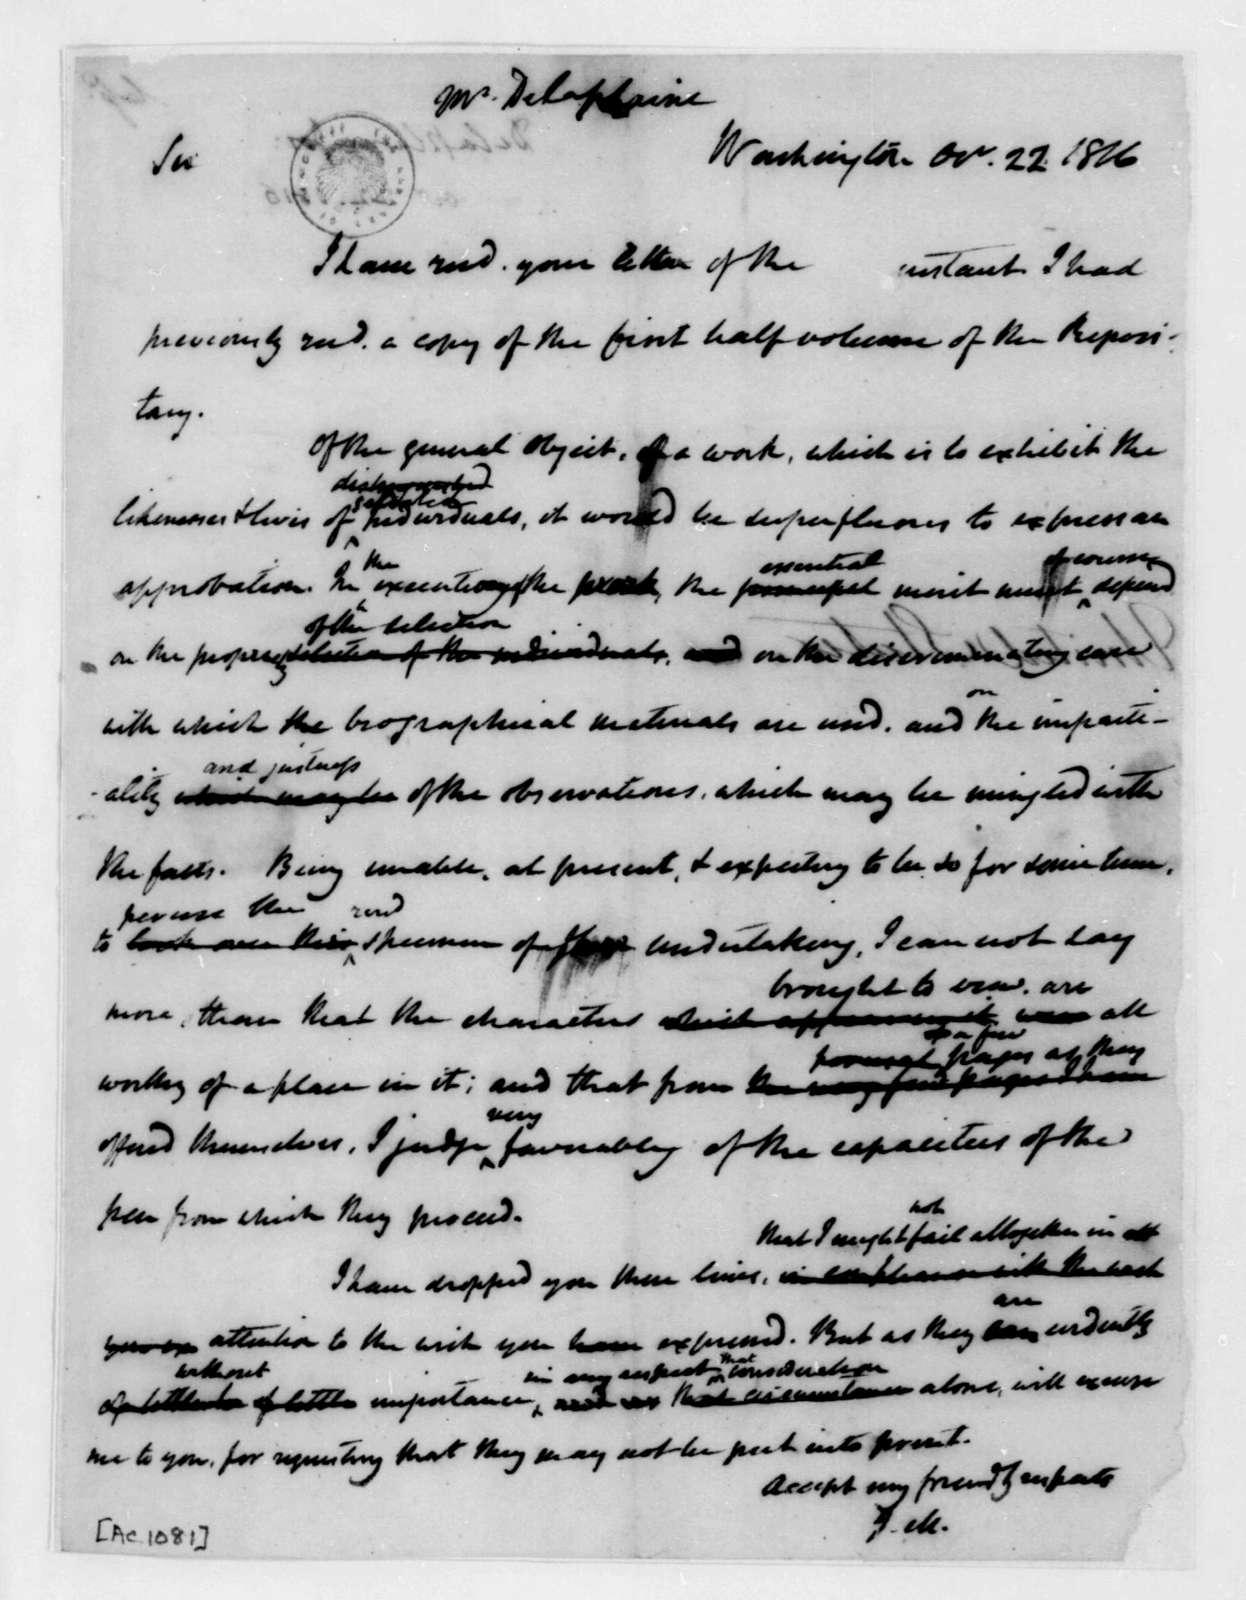 James Madison to Joseph Delaplaine, October 22, 1816.